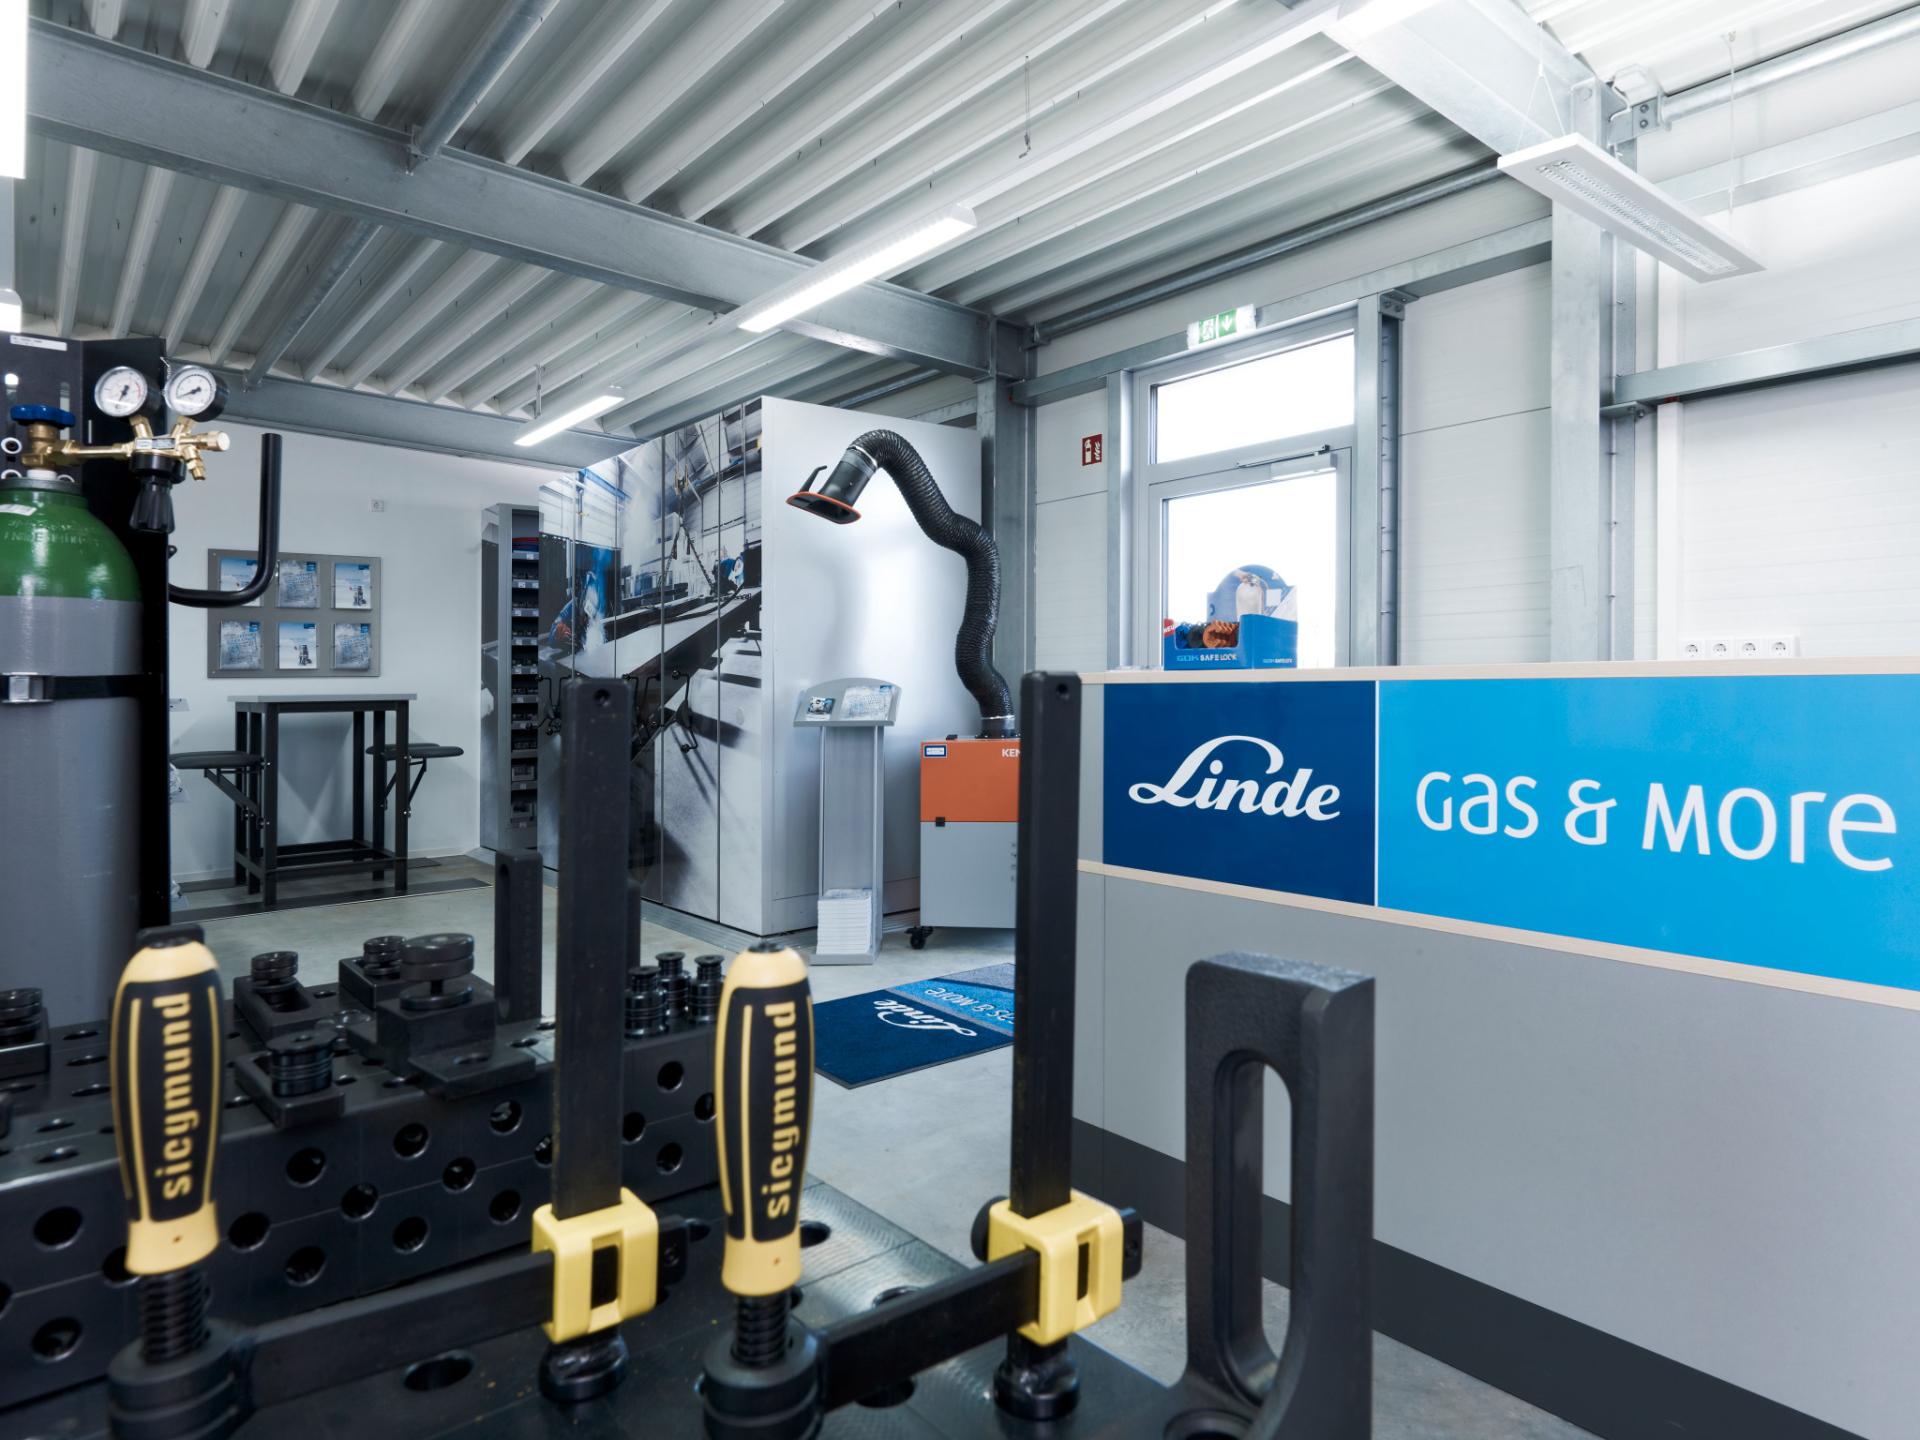 Linde Gas & More: Aktuell vakante Standorte